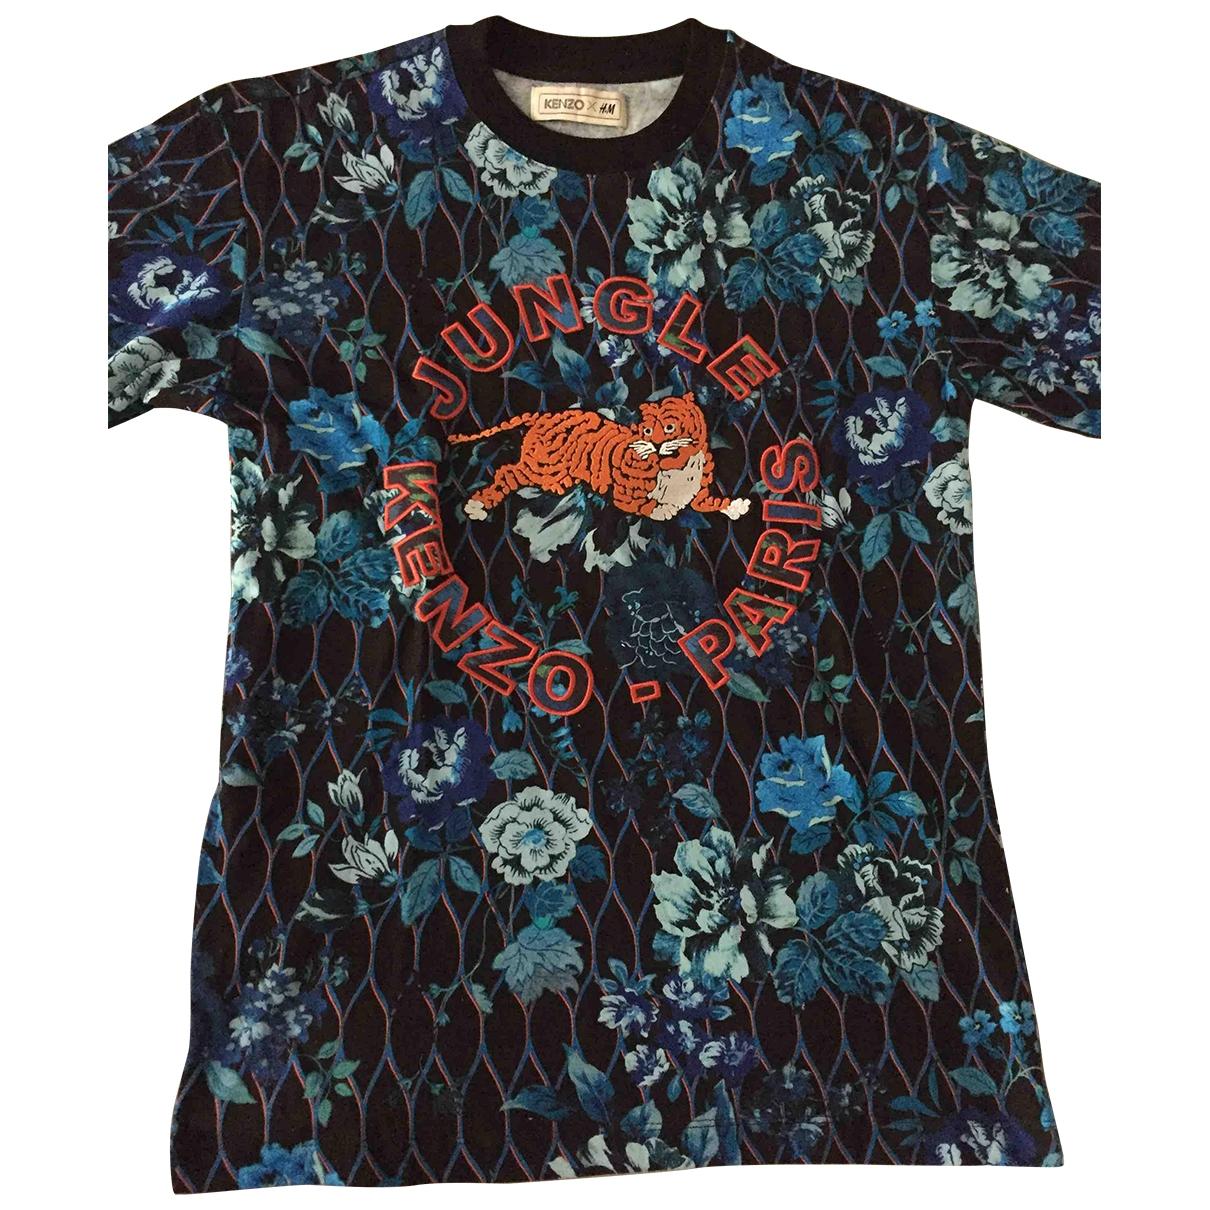 Camiseta Kenzo X H&m